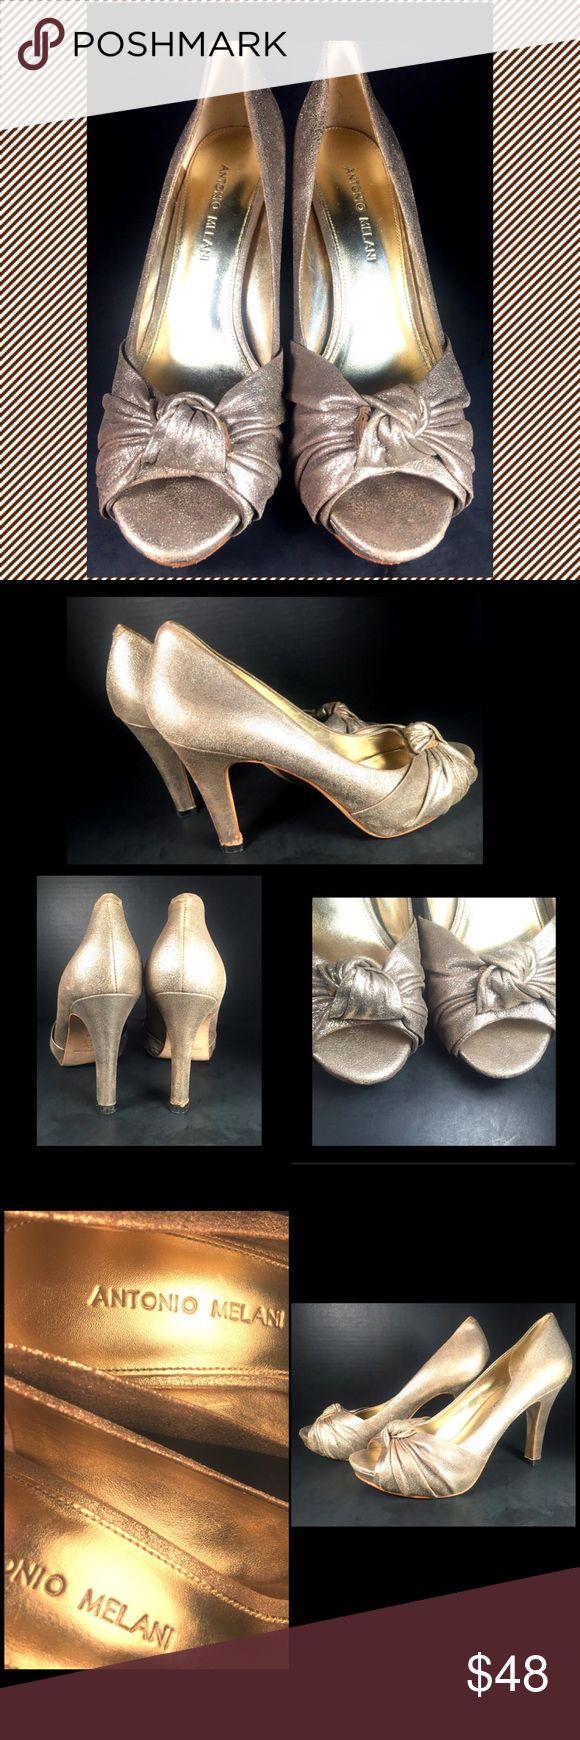 ANTONIO MELANI Gold Peep Toe Heels ANTONIO MELANI Gold Peep Toe Heels. Ladies Size 8.5M.  Light Wear and Marks.  Minor wear on Sole and Heel. Still Good Condition Shoes in super cute Melani style! Orig. $98.00. ANTONIO MELANI Shoes Heels